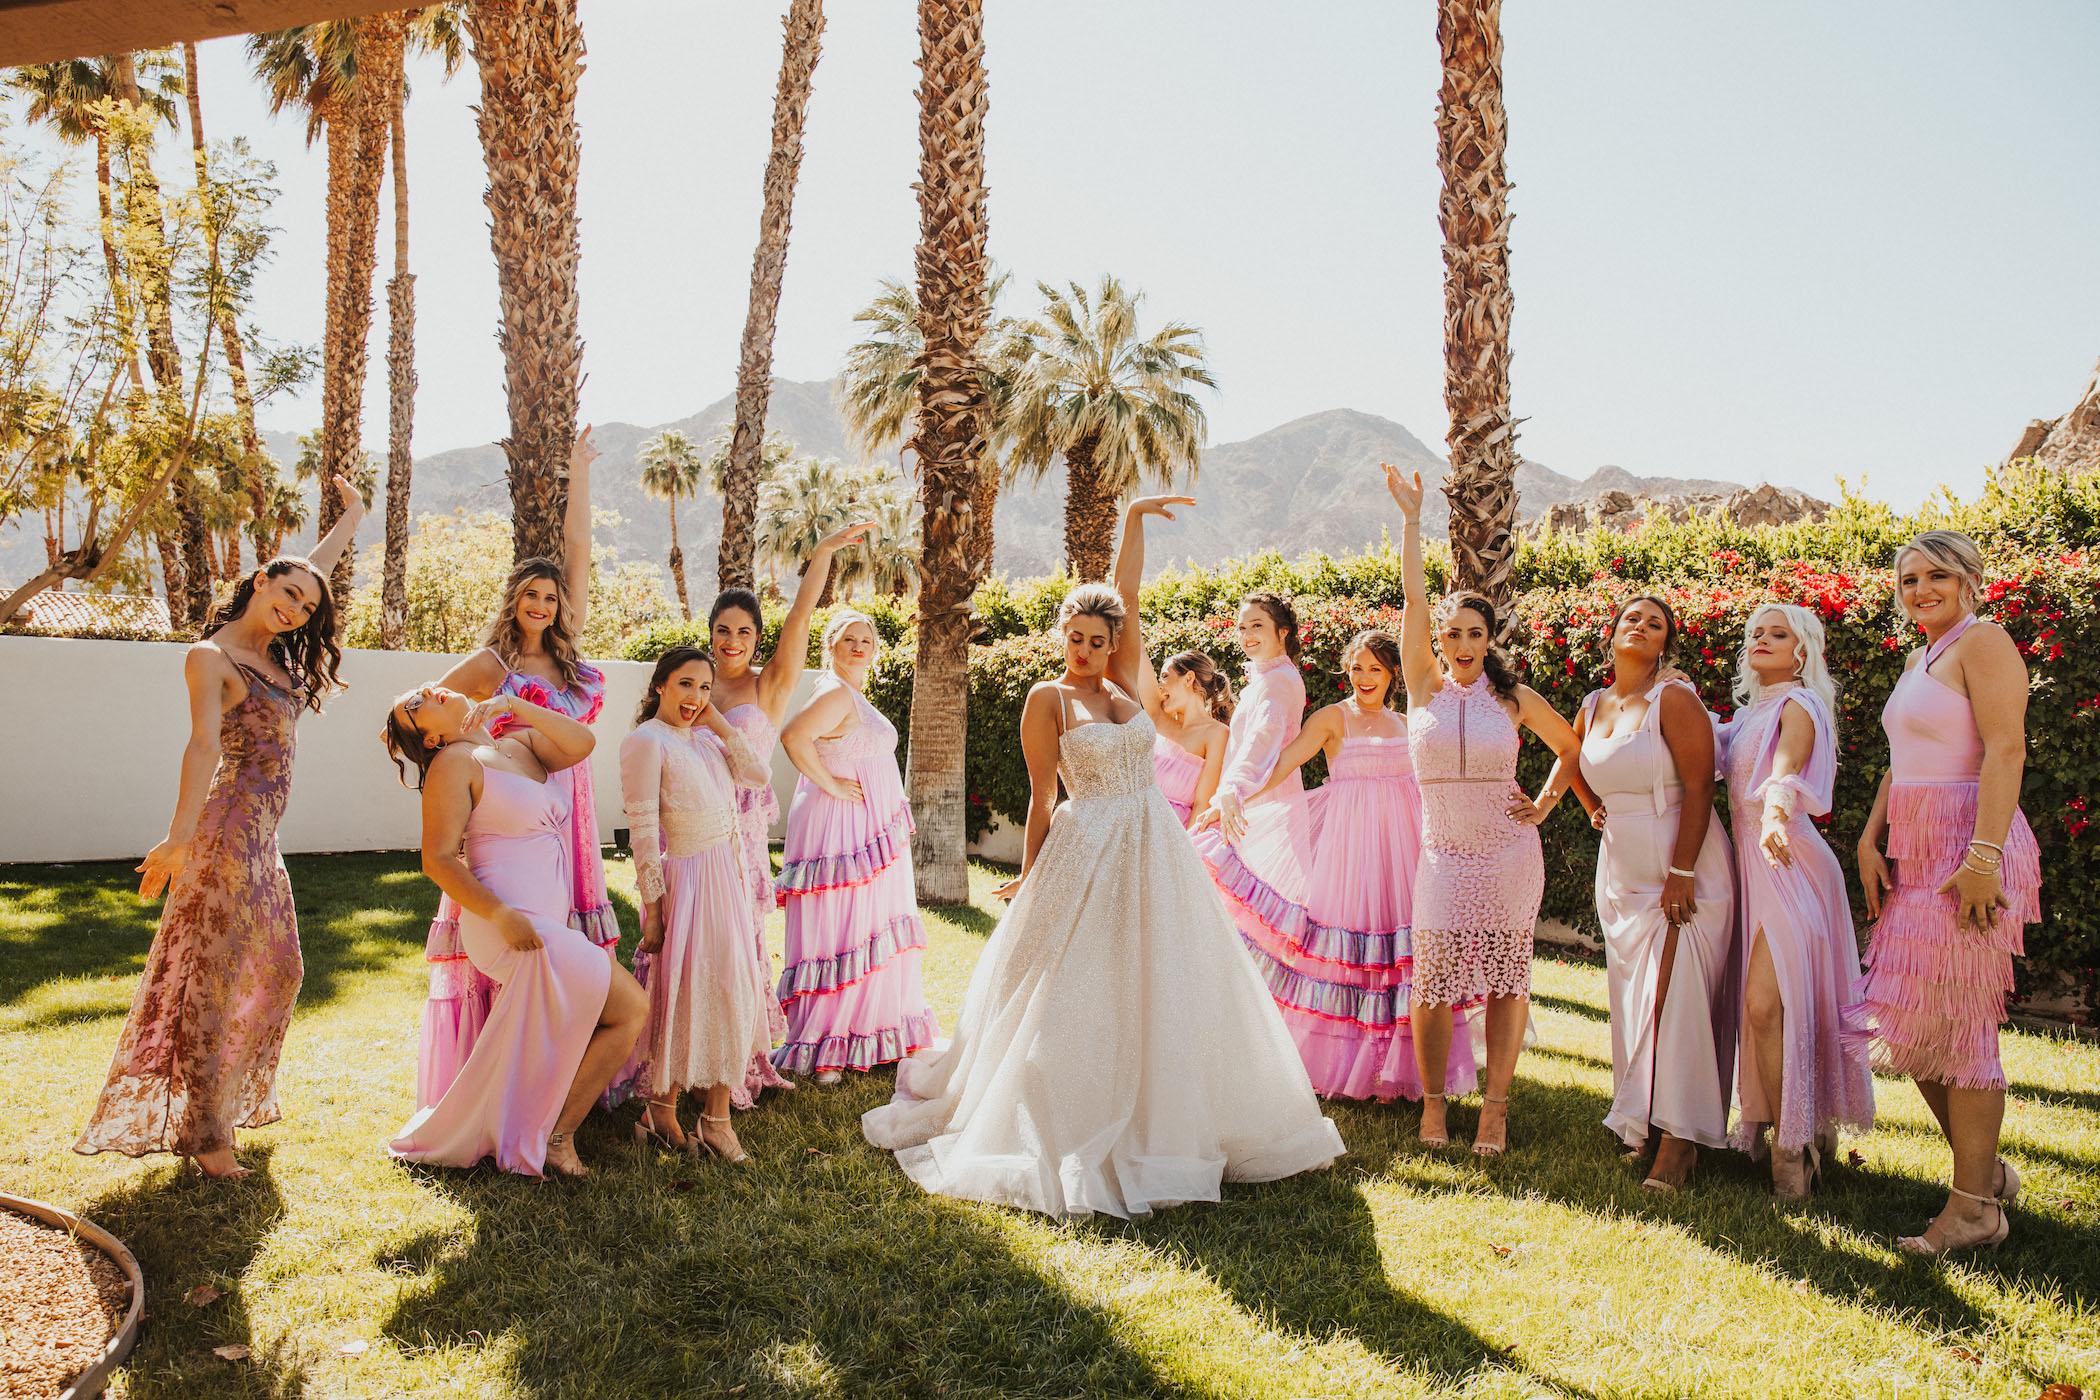 custom-bridesmaid-dresses